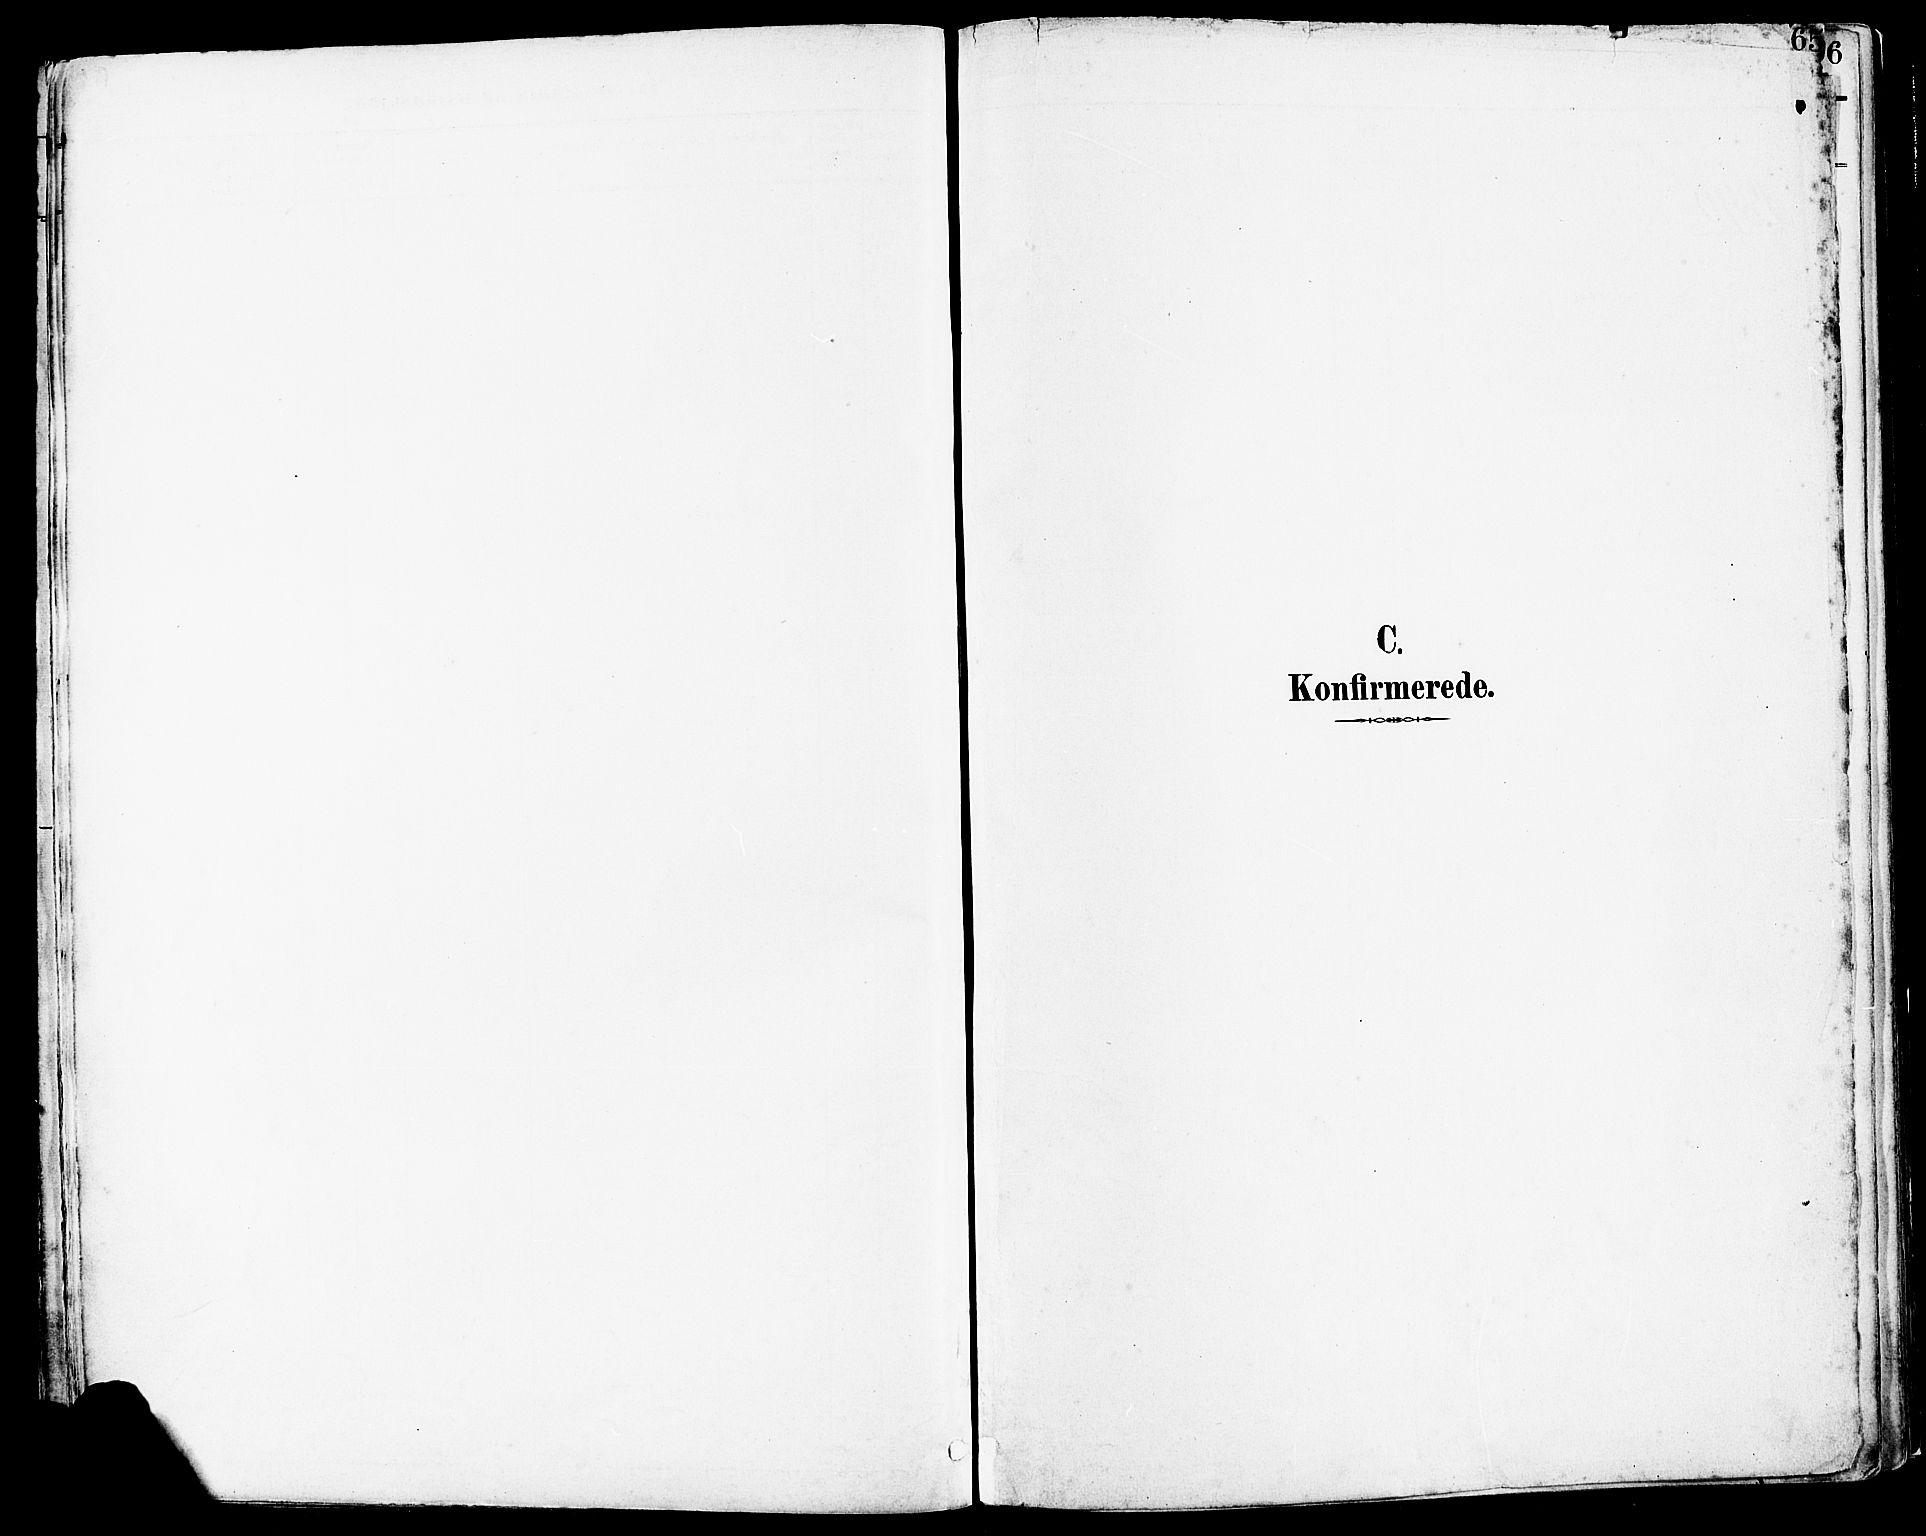 SAST, Høyland sokneprestkontor, 30BA/L0014: Ministerialbok nr. A 12, 1890-1898, s. 65